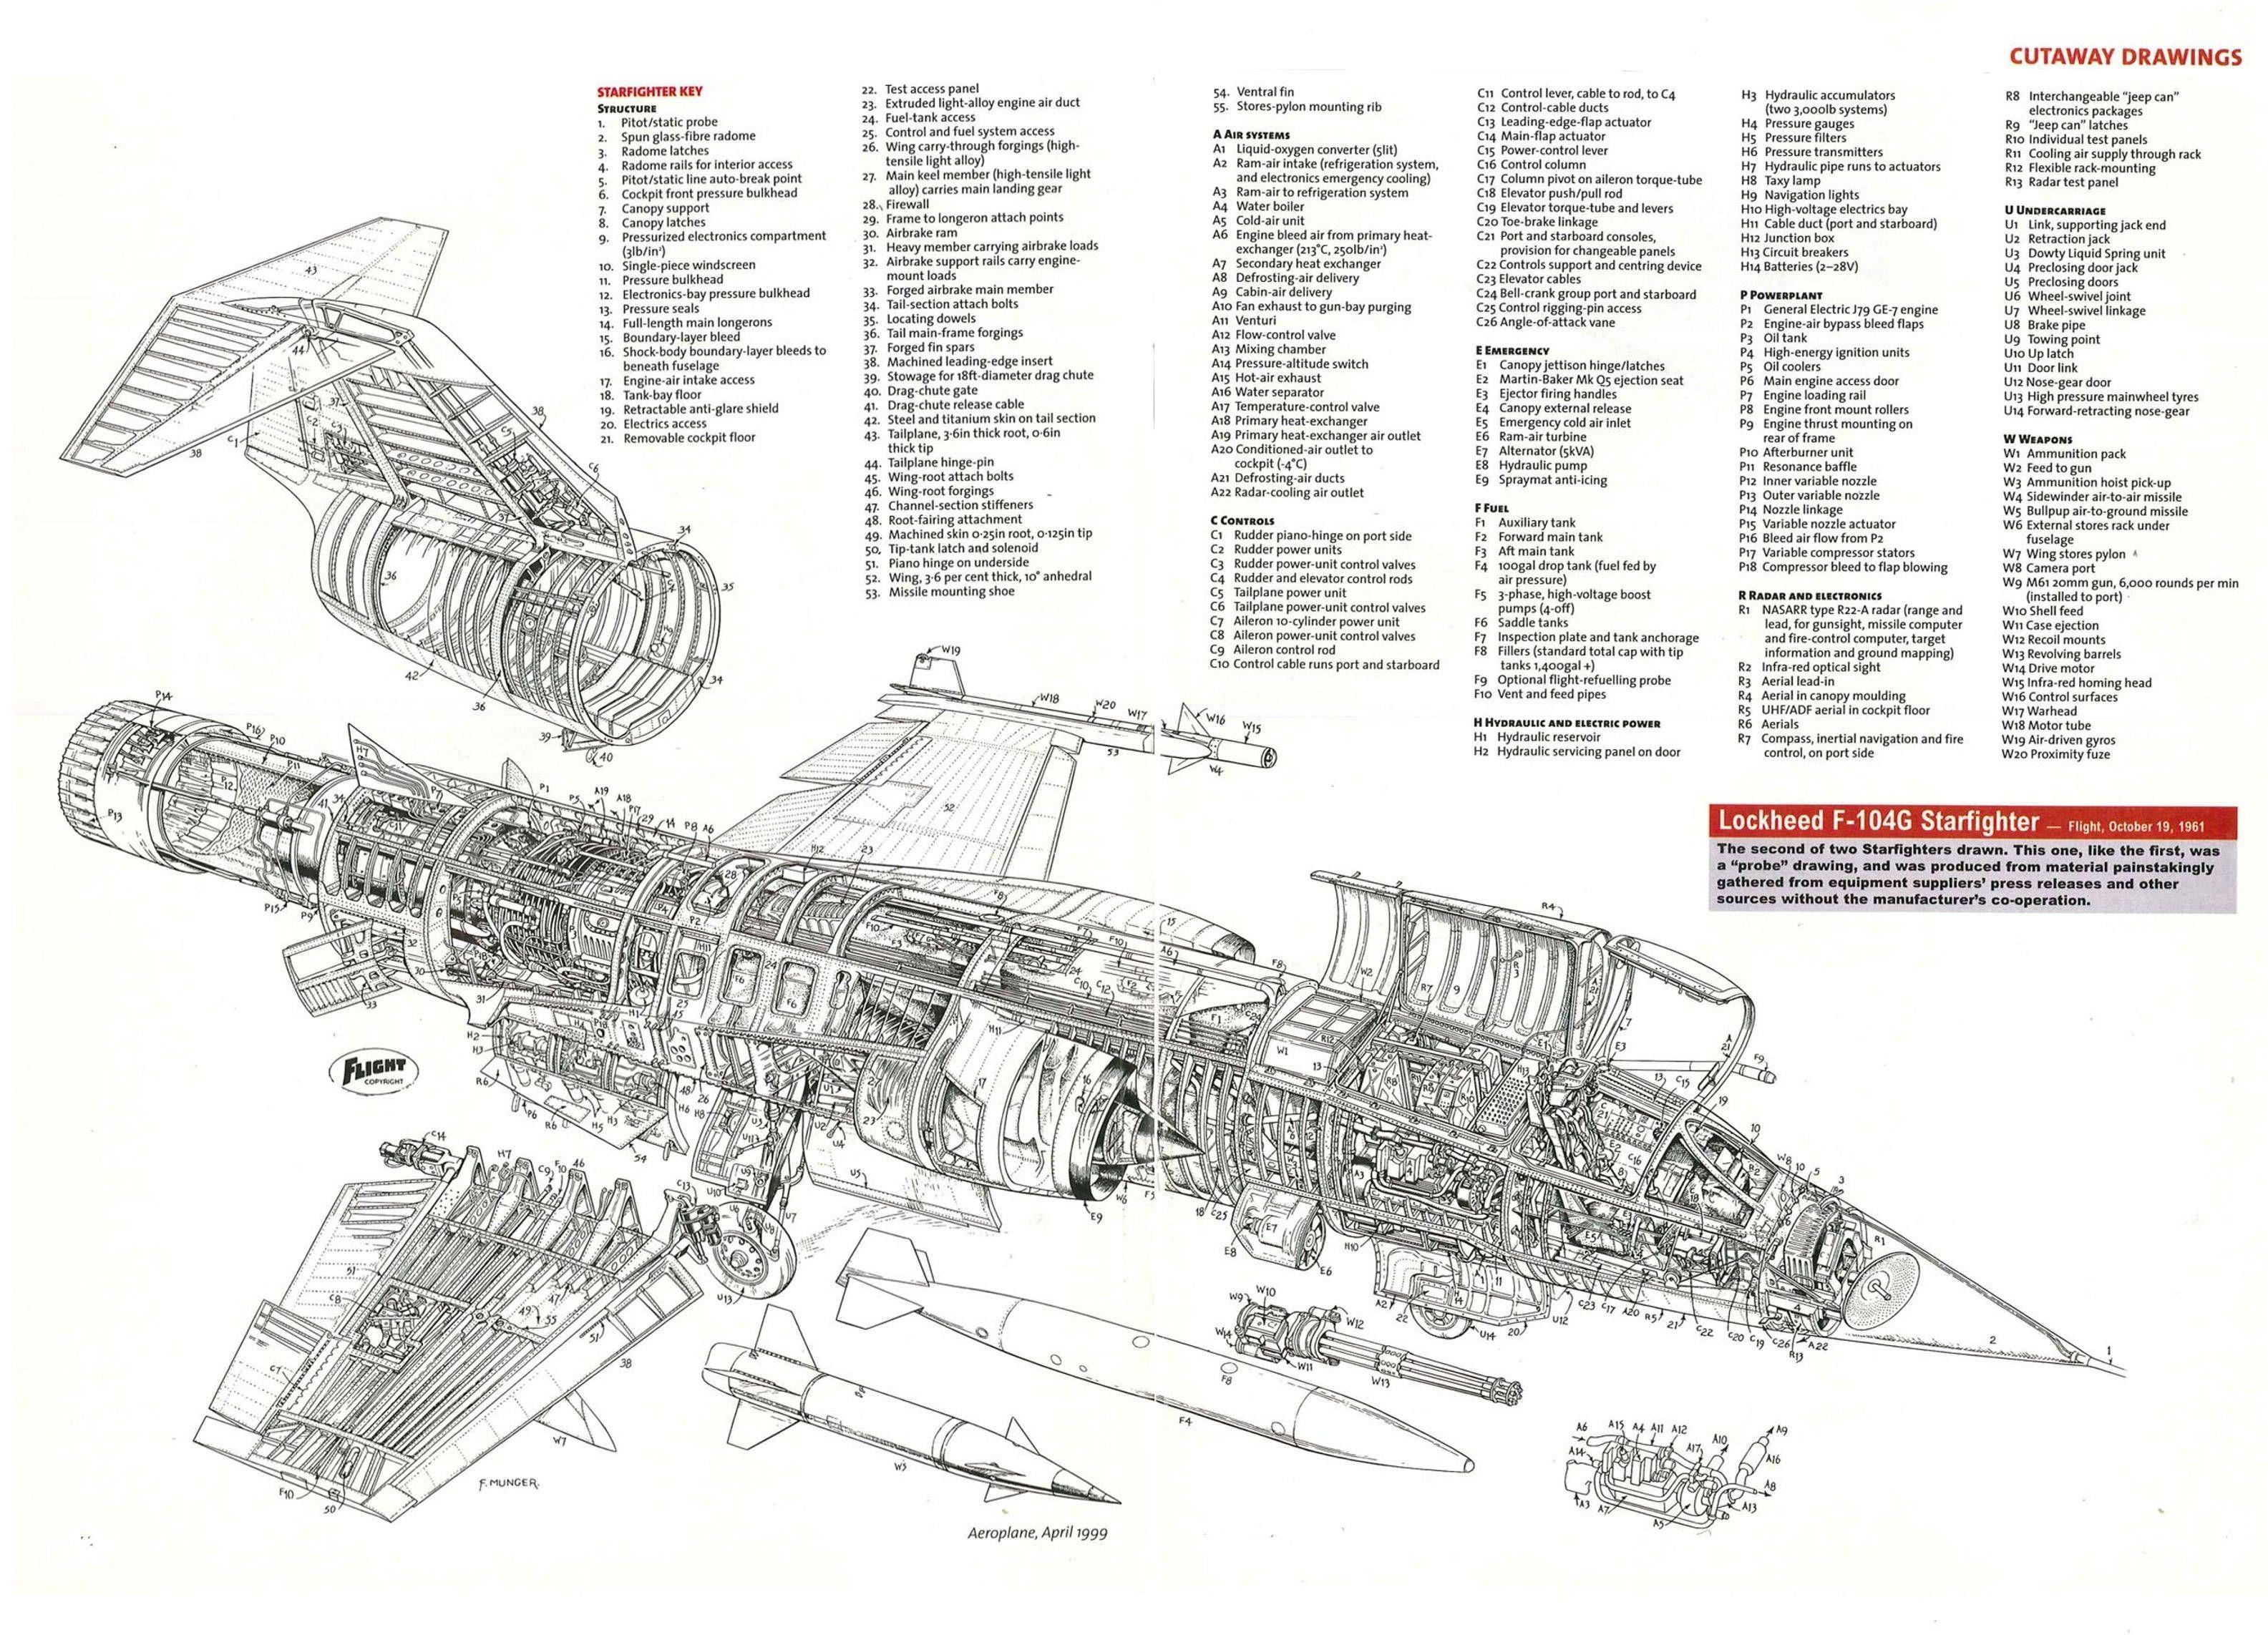 Lockheed F 104g Starfighter